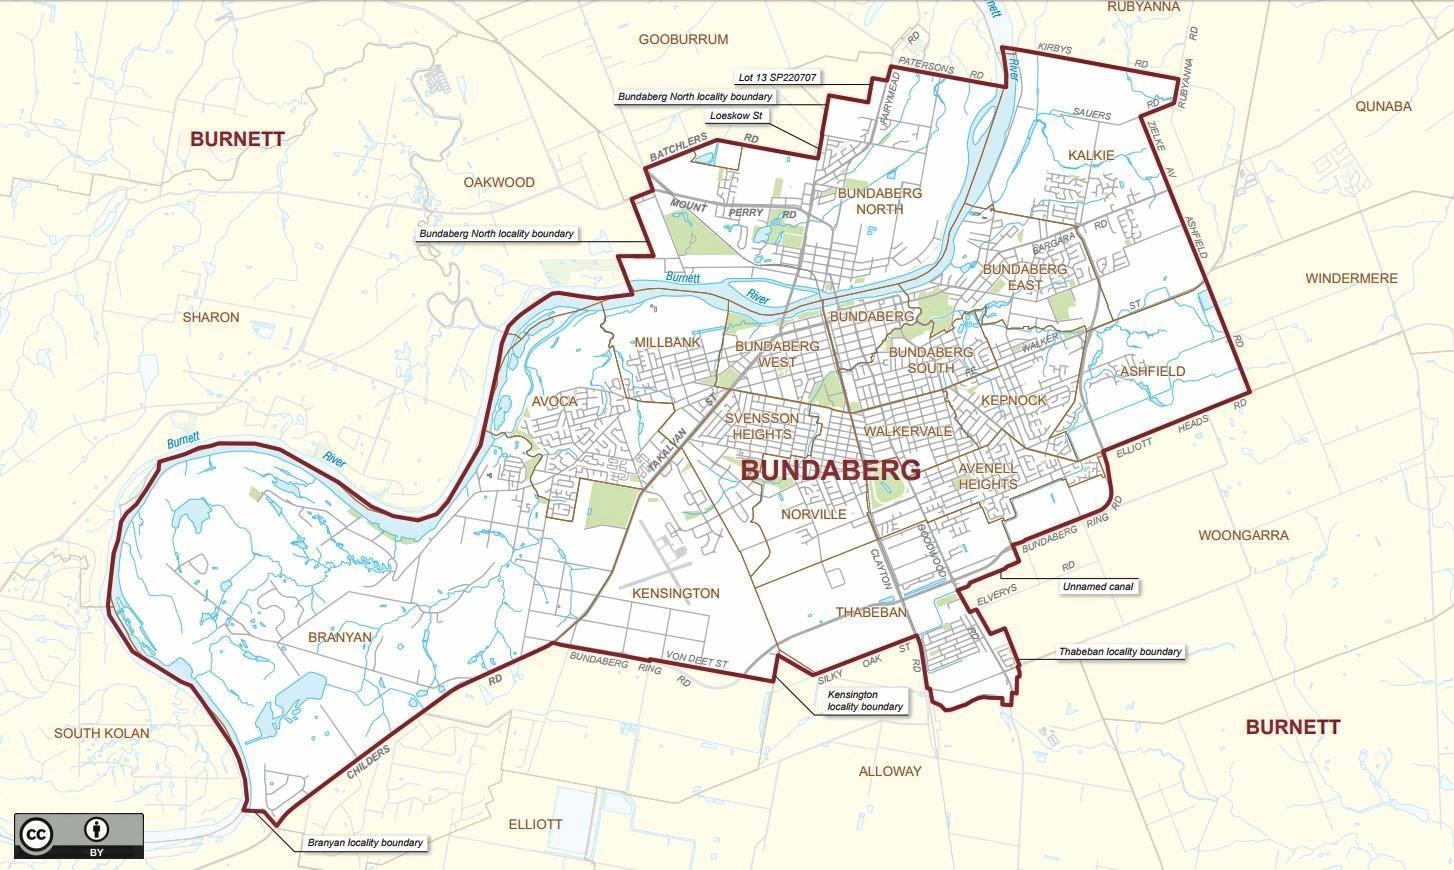 SURROUNDED: The seat of Bundaberg is surrounded by Burnett.